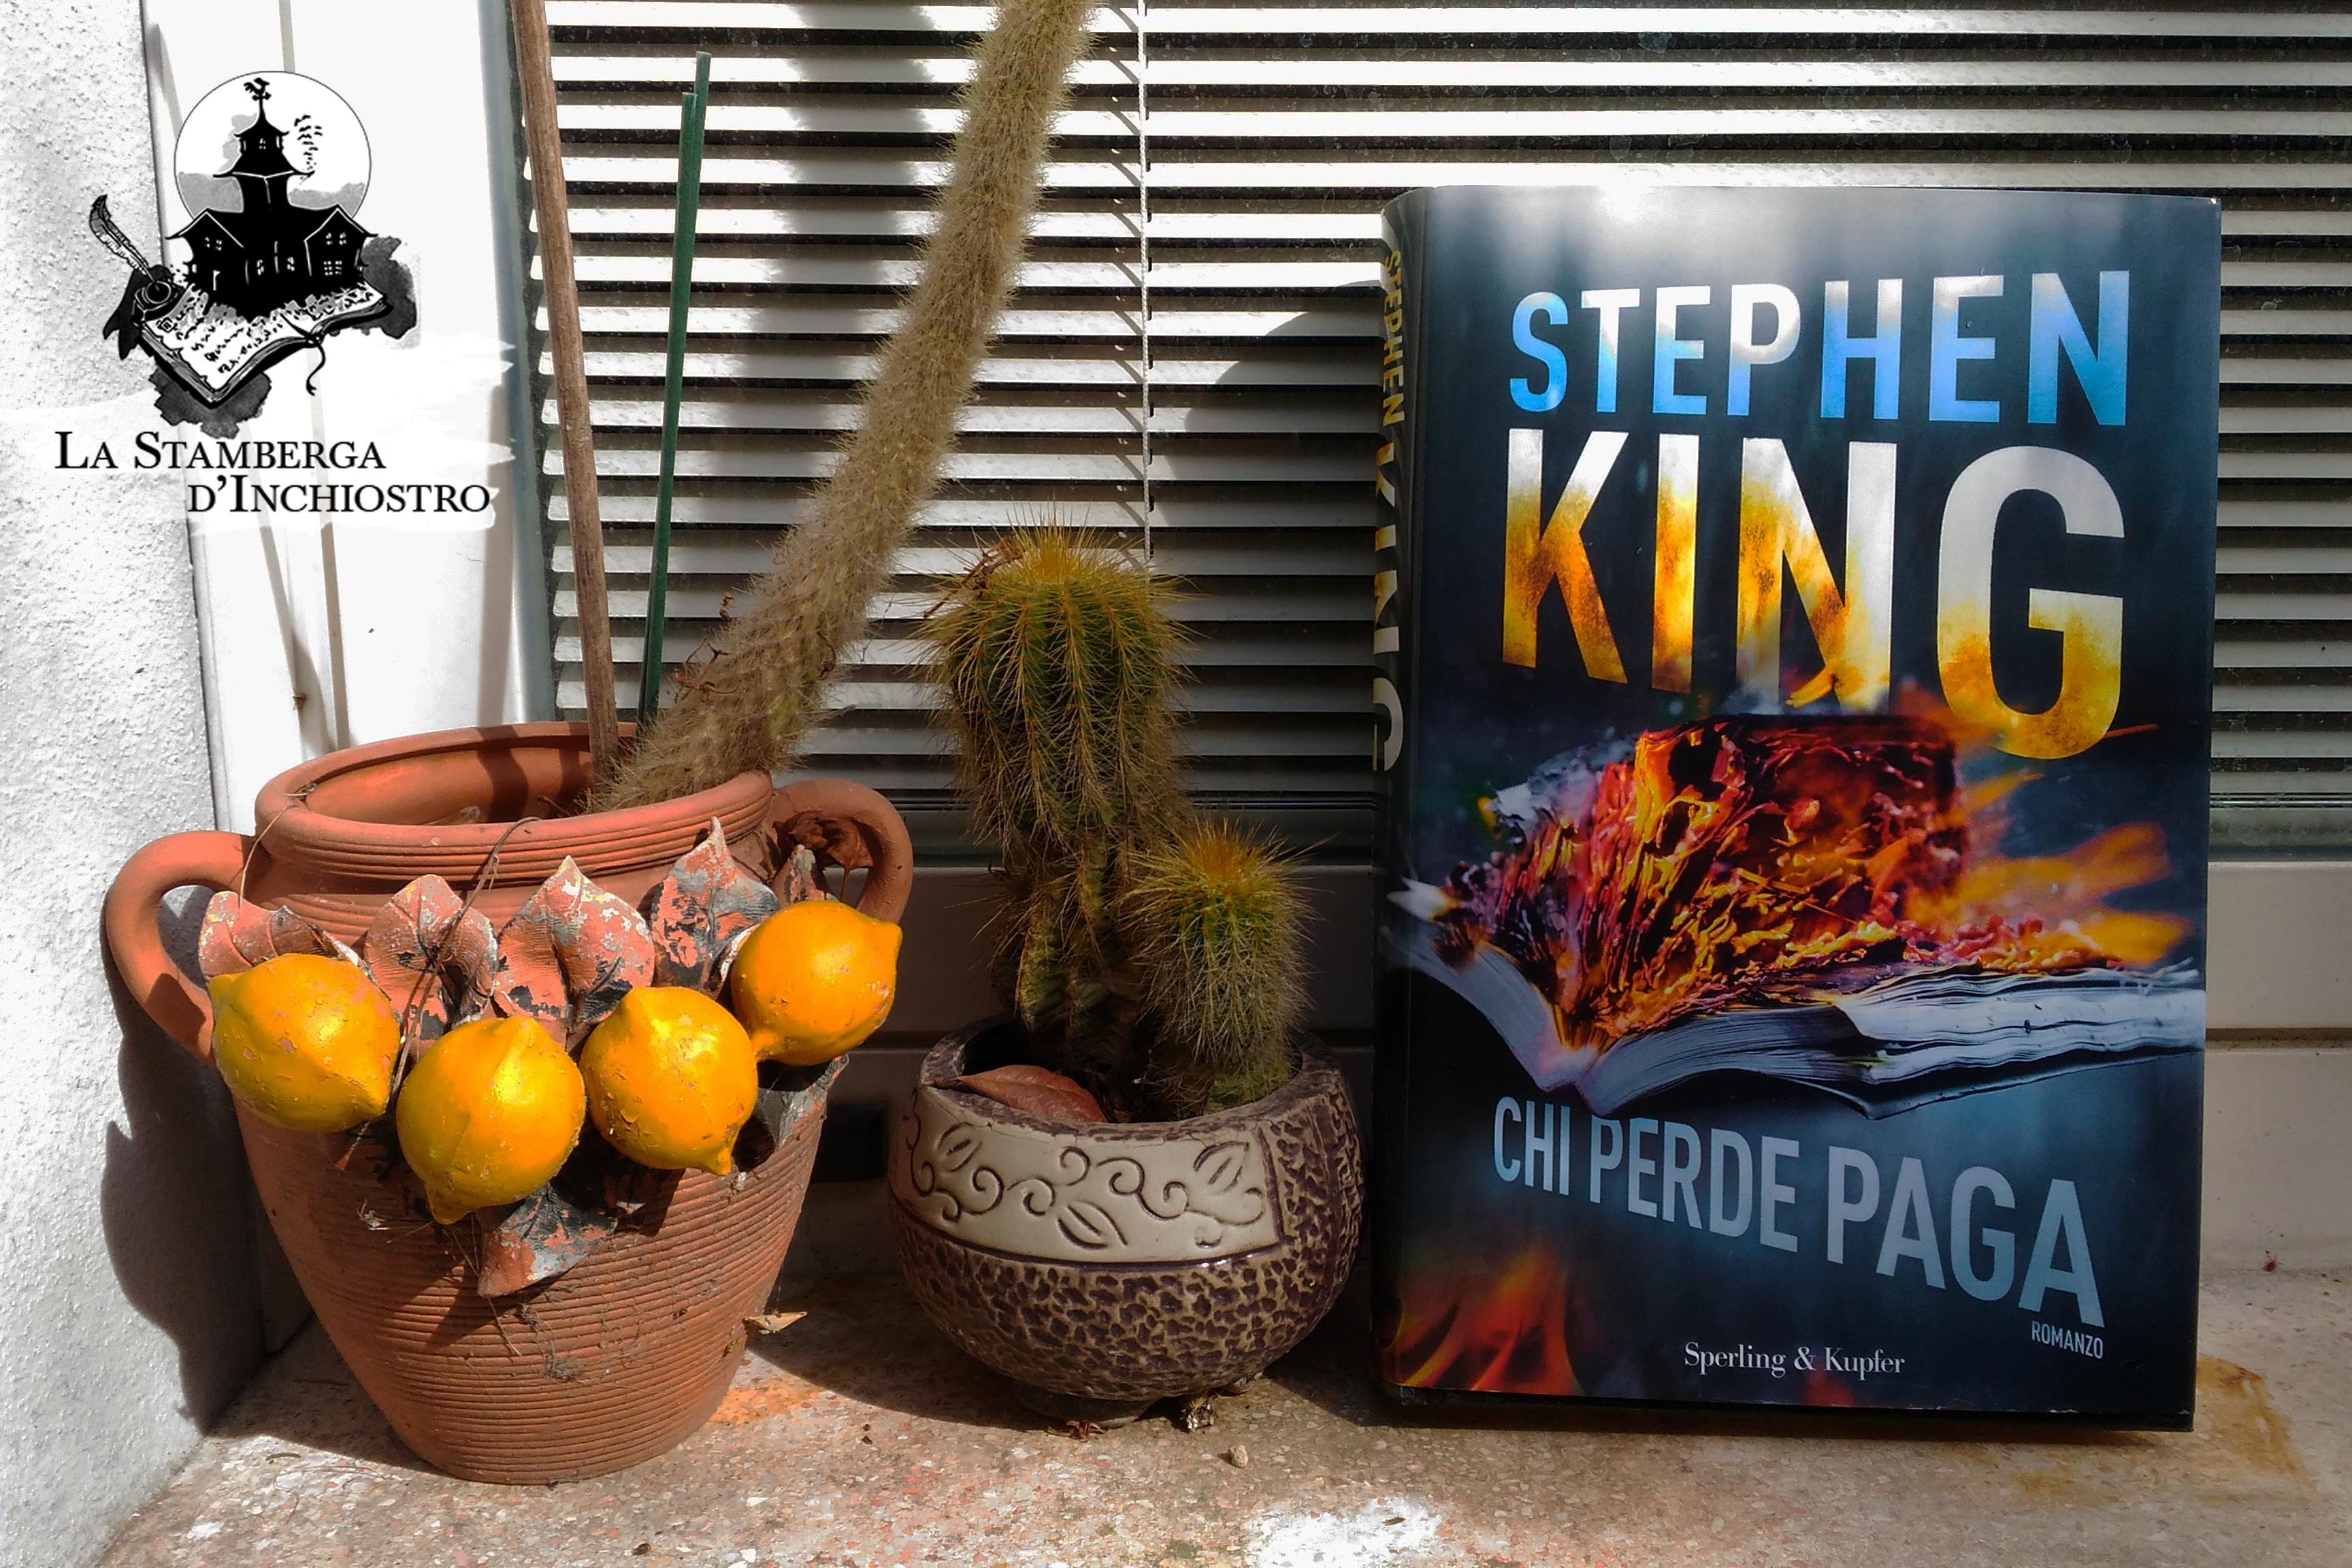 Stephen King - Chi perde paga